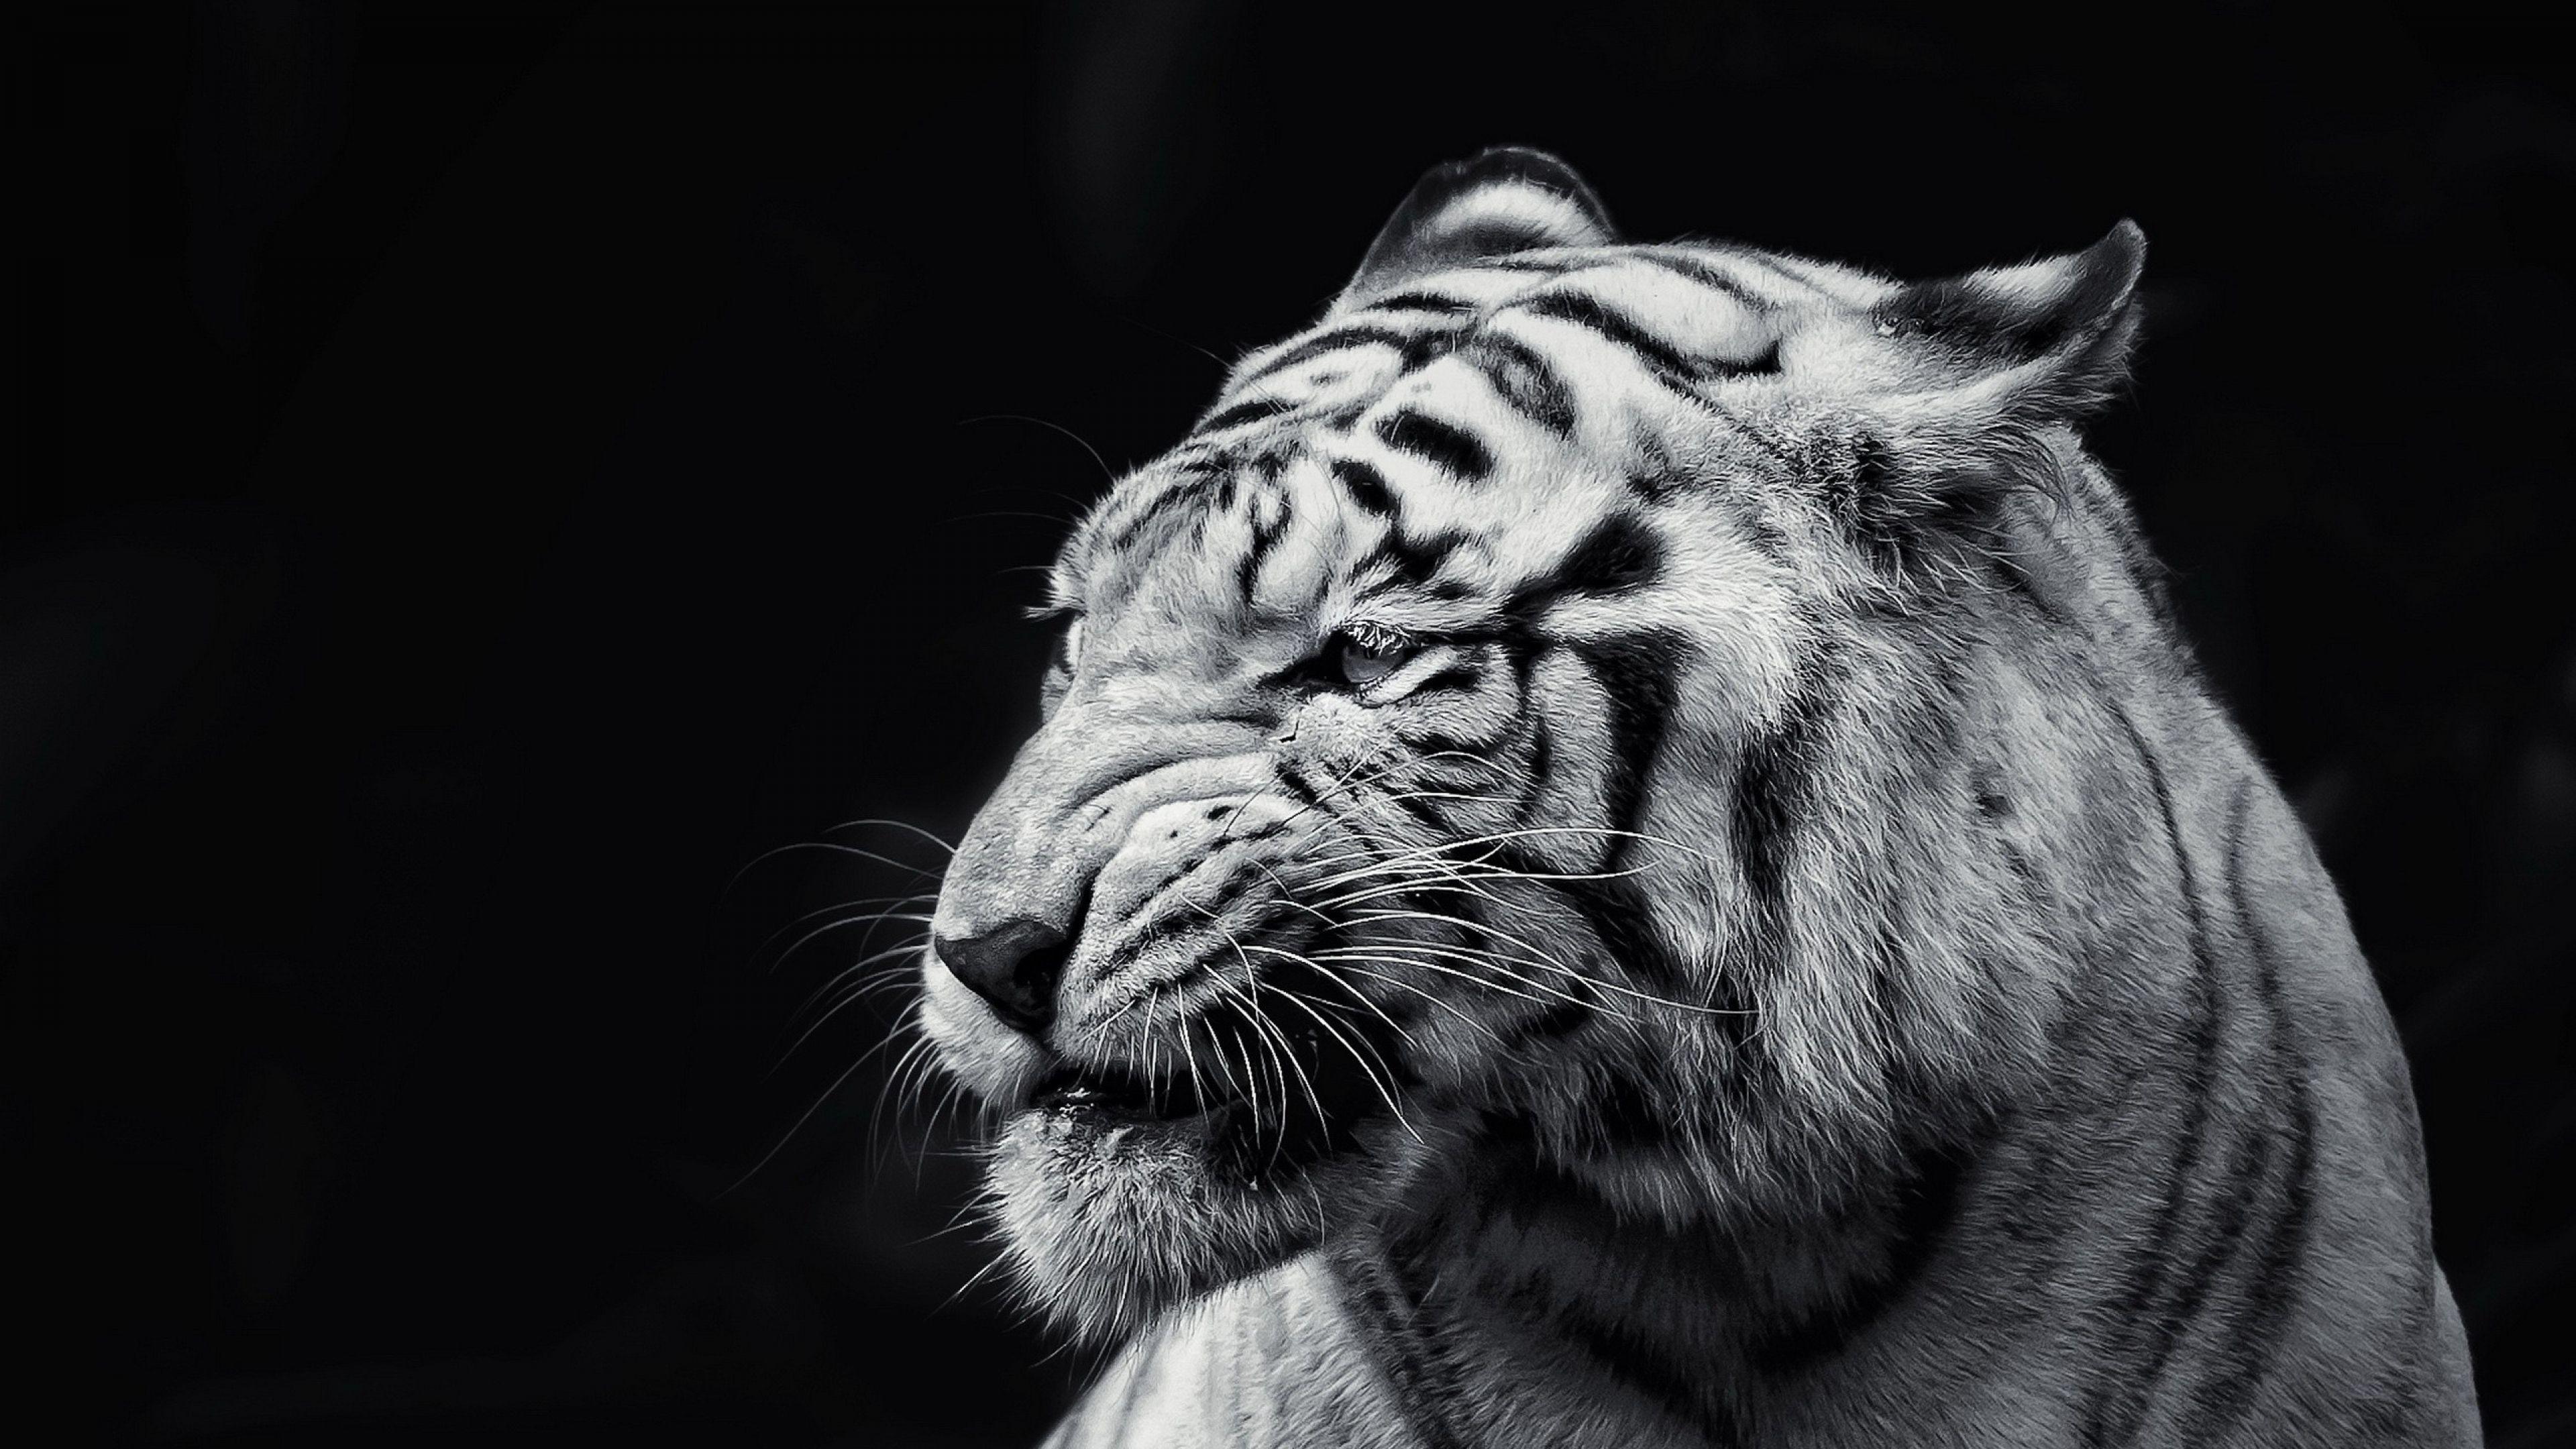 Download Wallpaper Tiger, Face, Eyes, Black and white 4K .